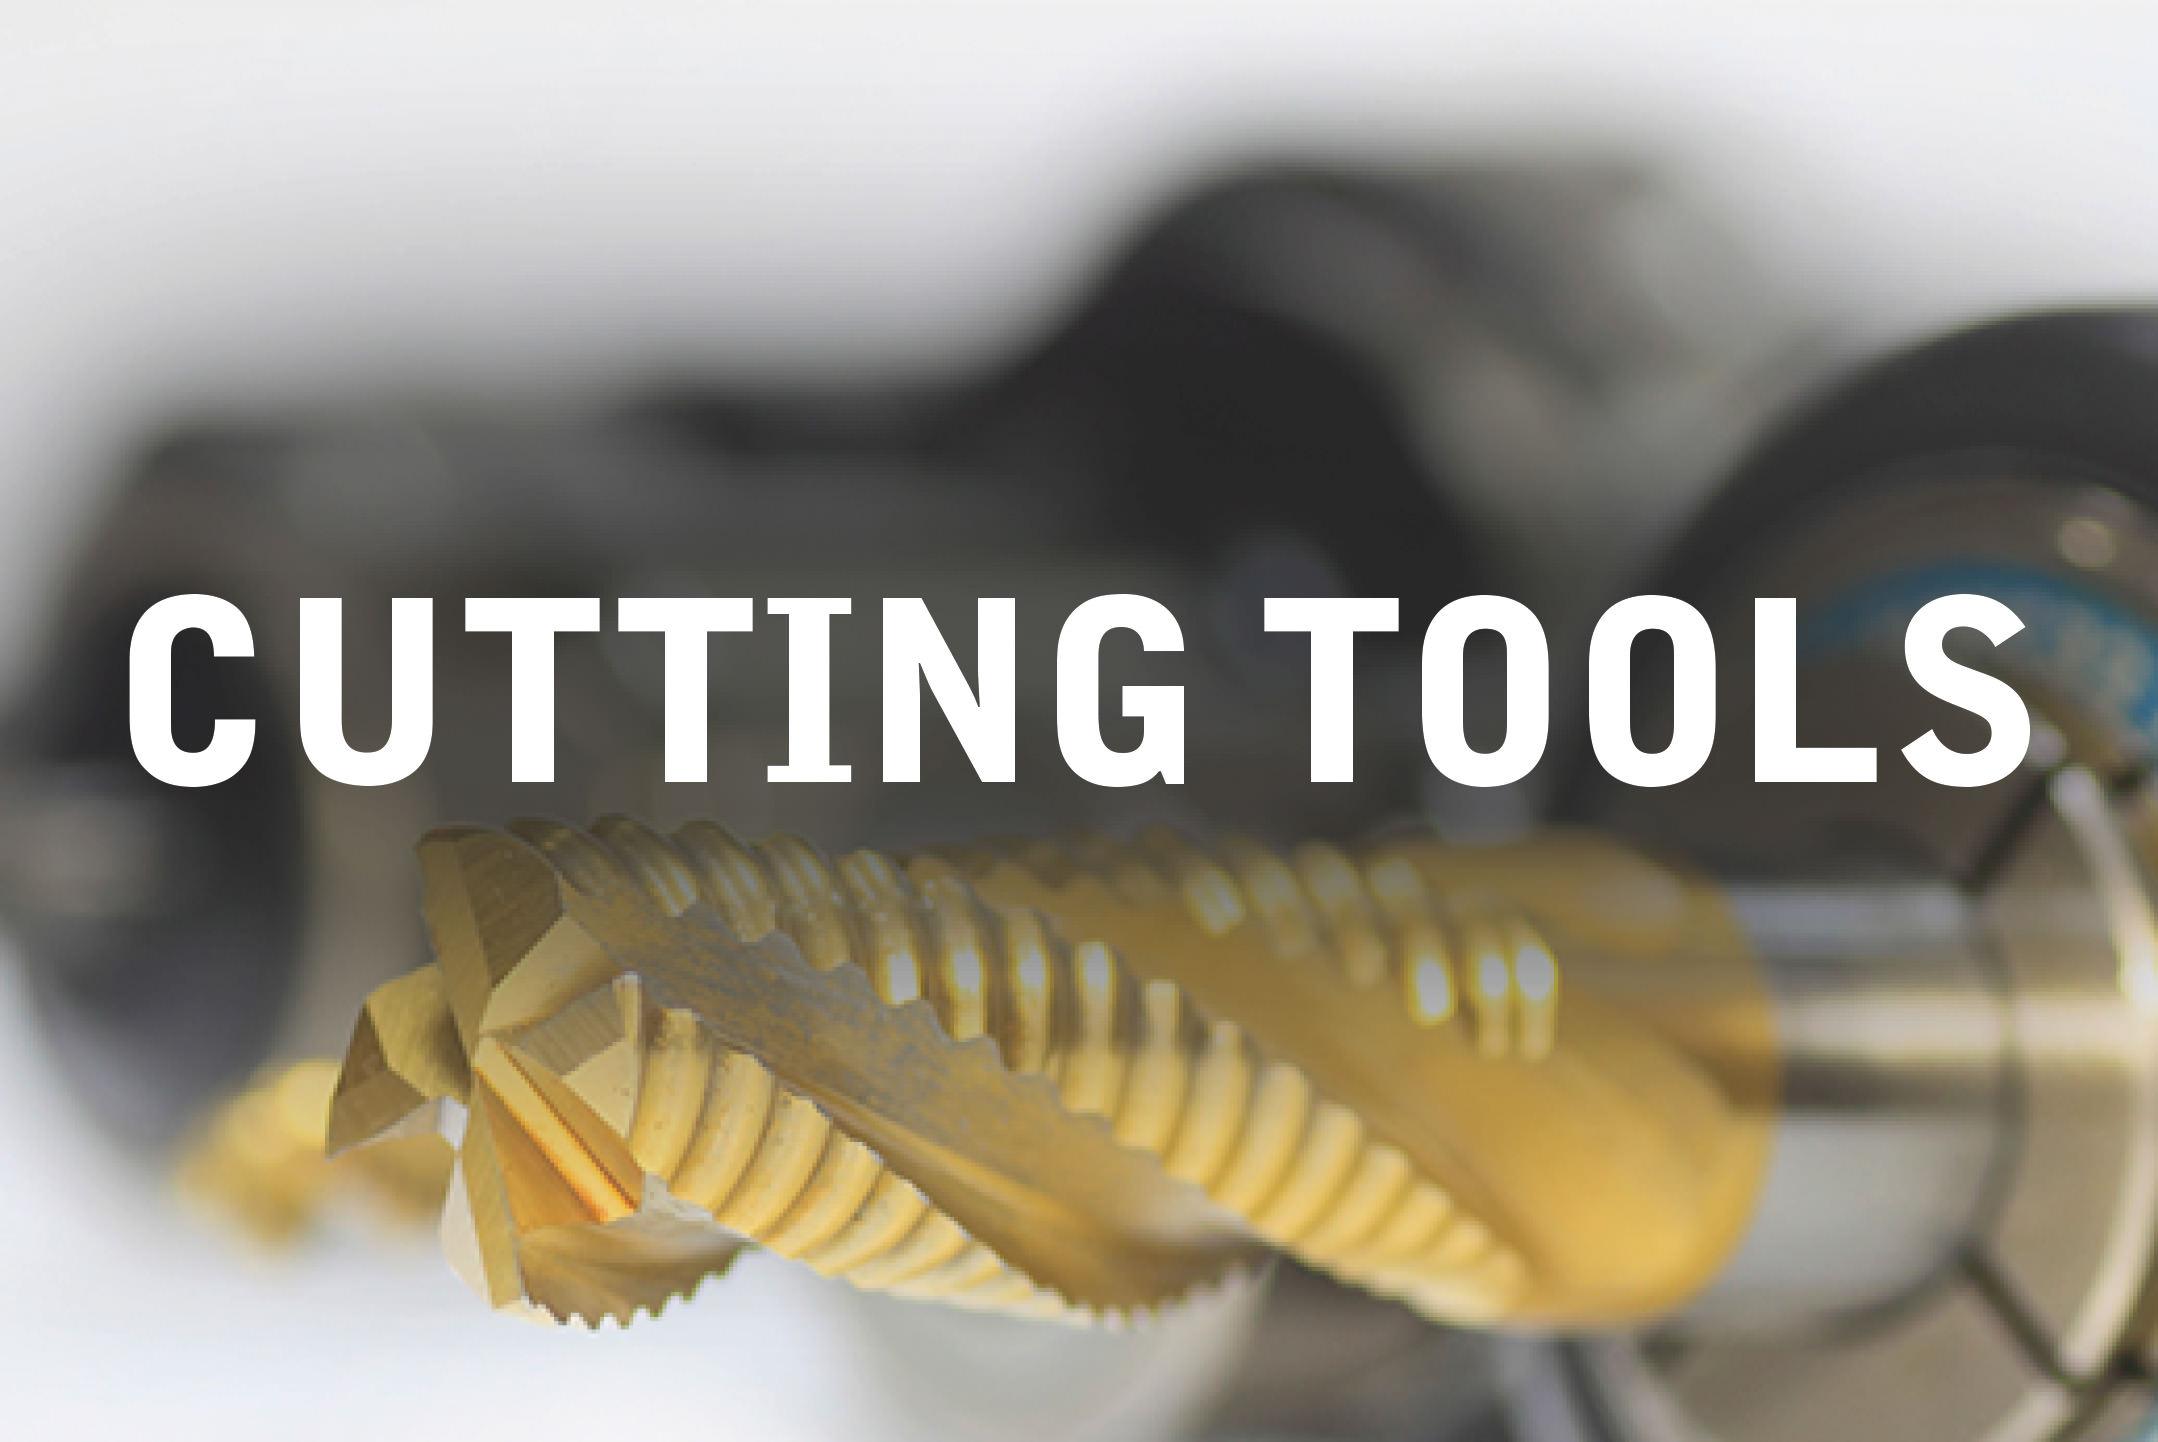 HOME-BTNS_cutting tools.jpg